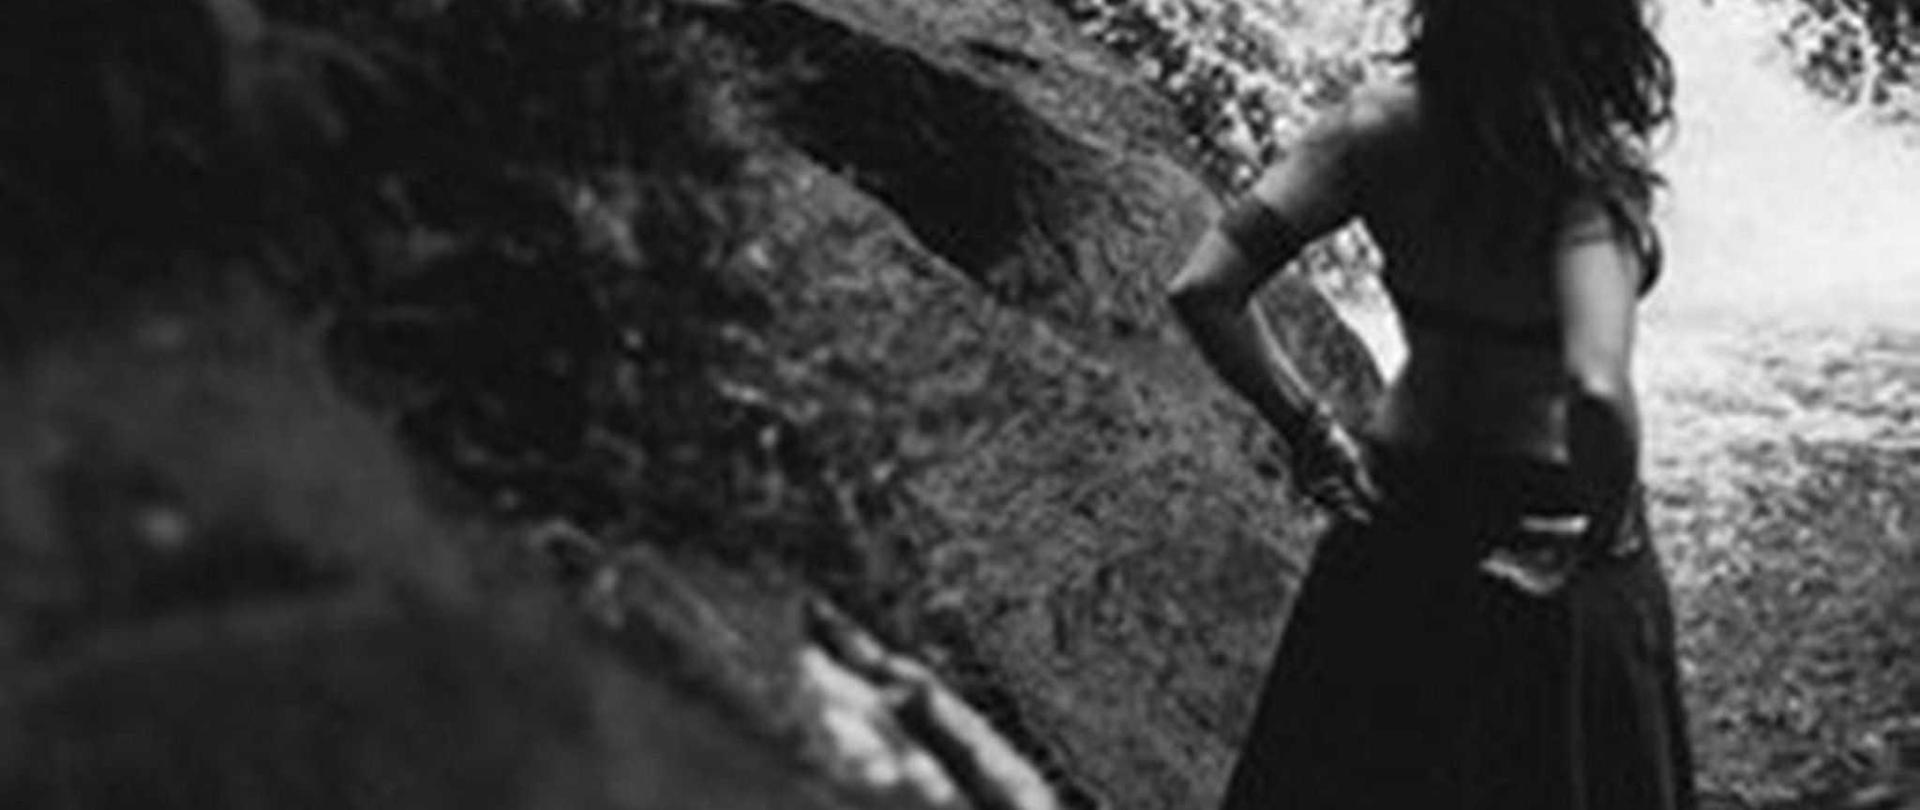 cachoeira-prumirim-ubatuba-set-16-56.jpg